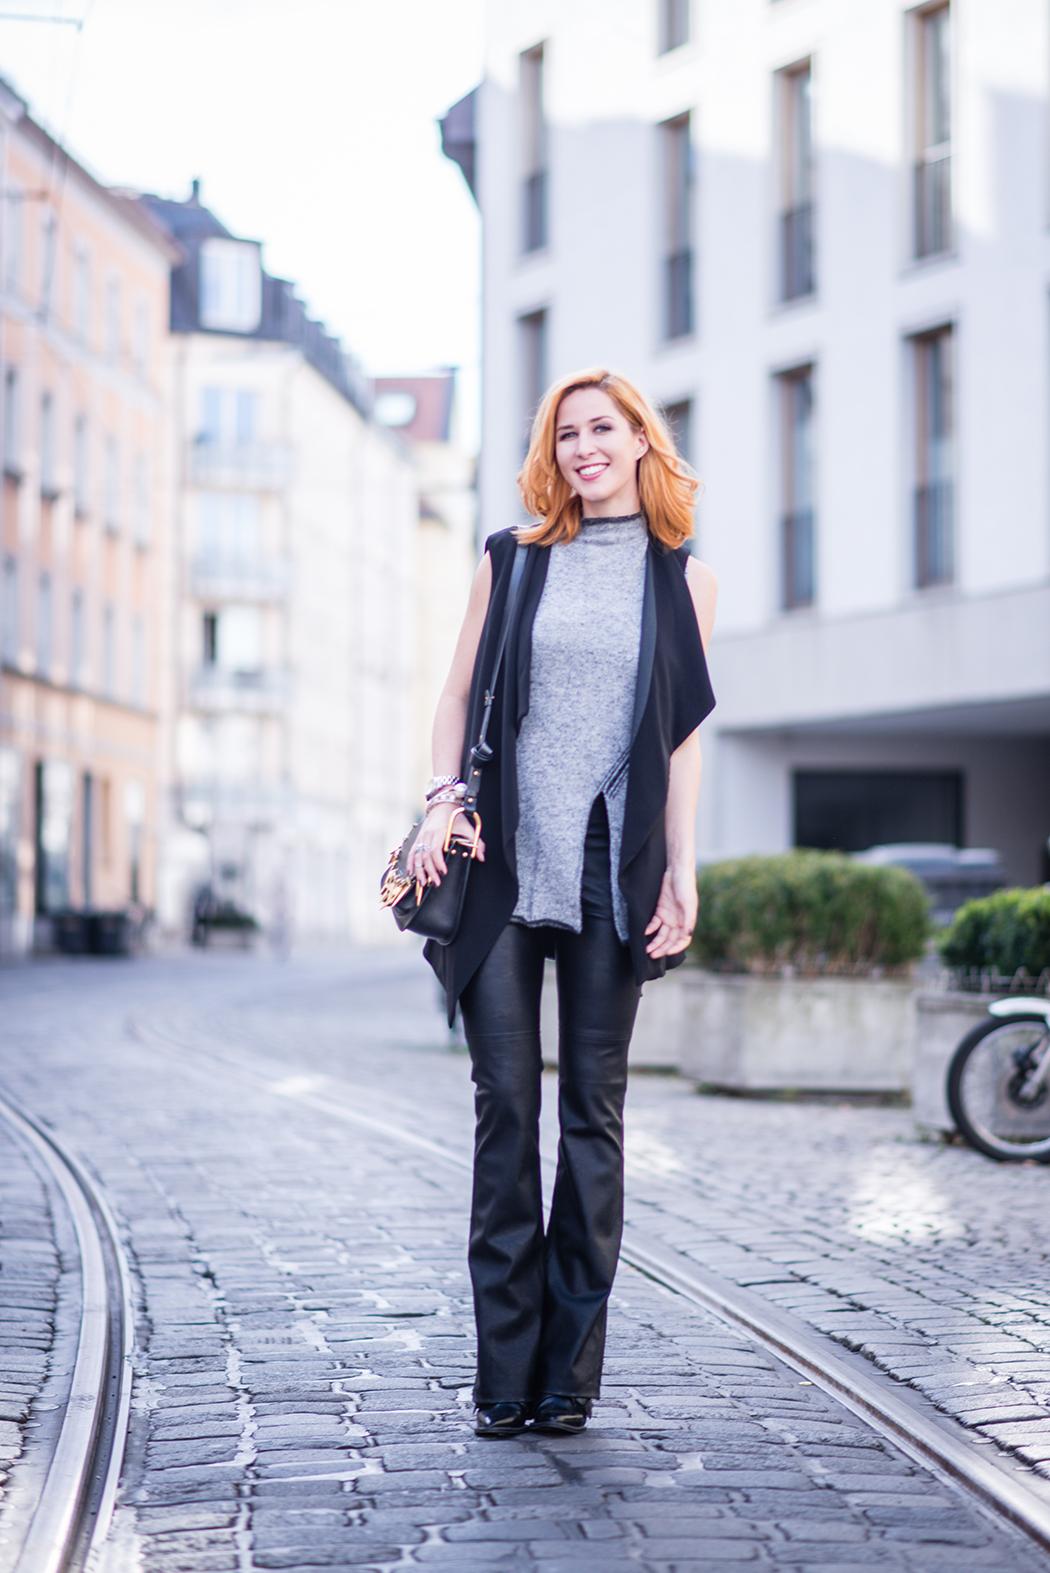 Fashionblog-Fashionblogger-Fashion-Blog-Blogger-München-Deutschland-Linda-Lindarella-erdbeerblond-Chloé-Hudson-Lederschlaghose-6-web